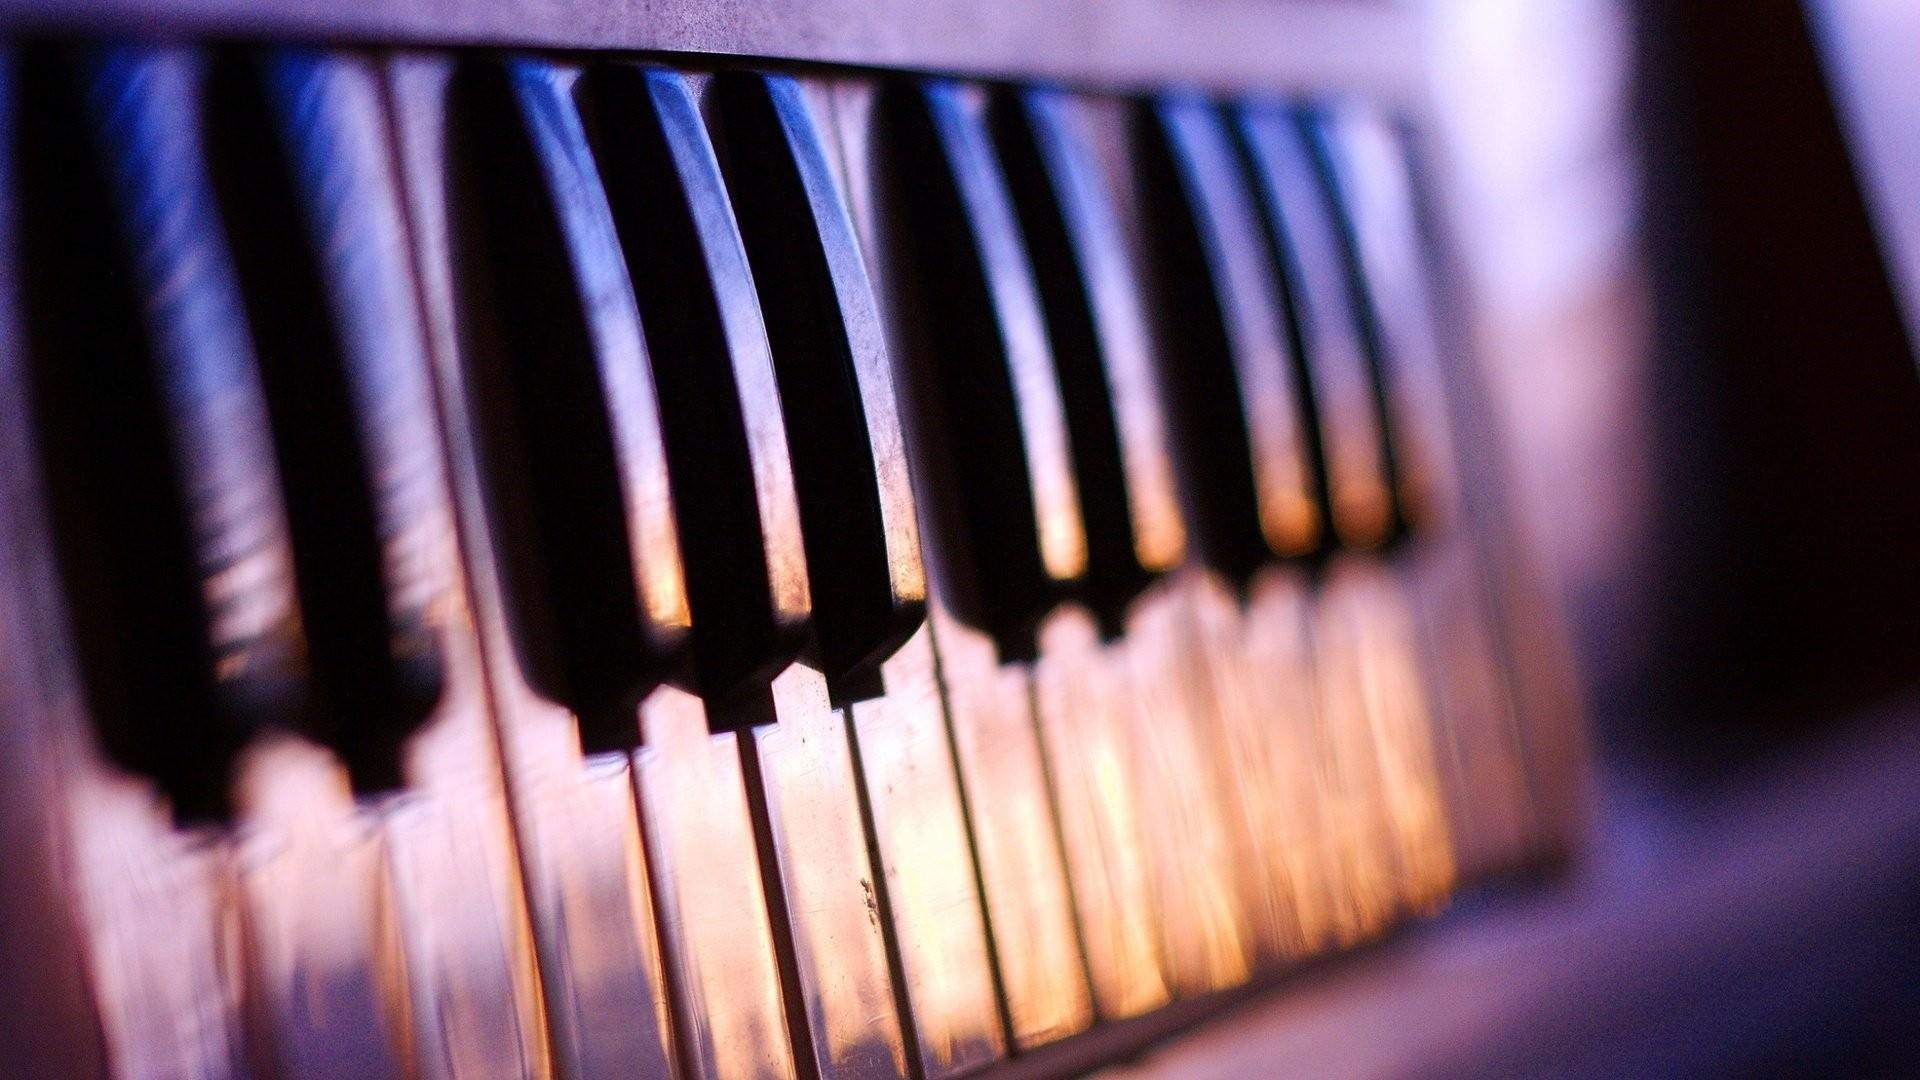 Piano Wallpaper image hd